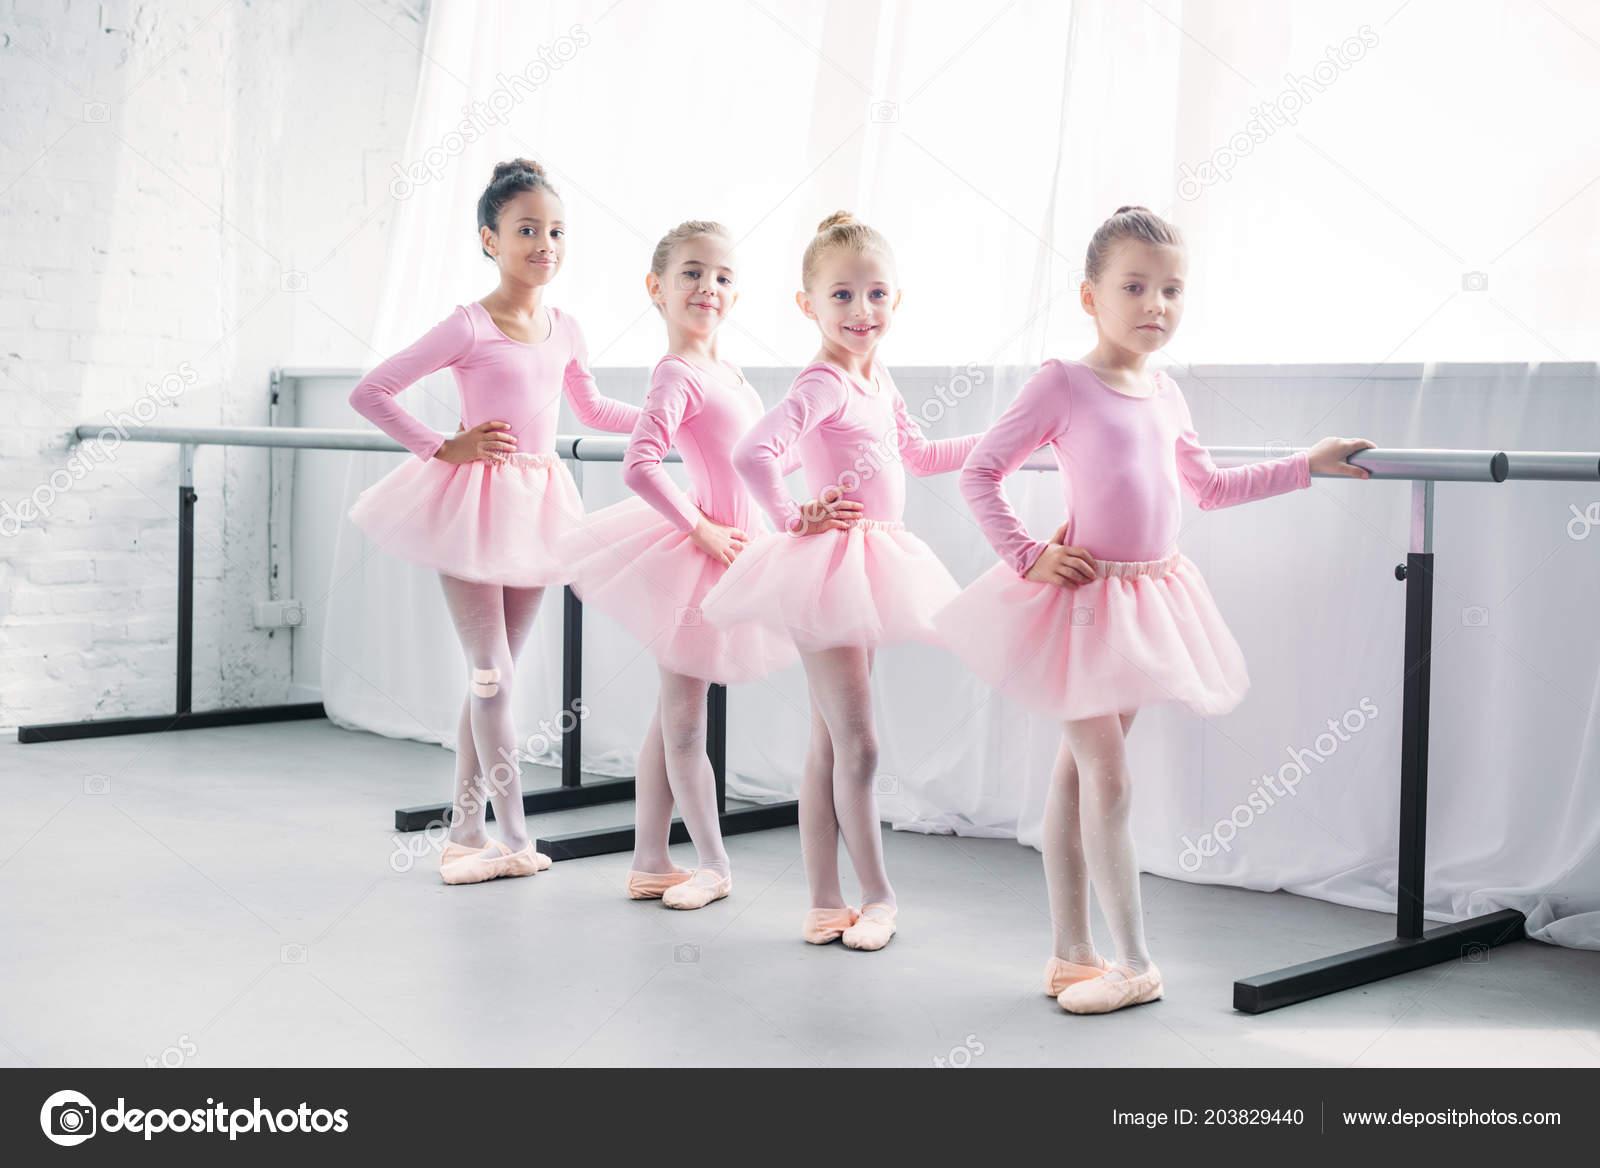 bd66e49de3c Χαριτωμένα Παιδιά Πολυεθνική Ποδηλάτισσες Ροζ Τουτού Άσκηση Και  Χαμογελαστός Στην — Φωτογραφία Αρχείου